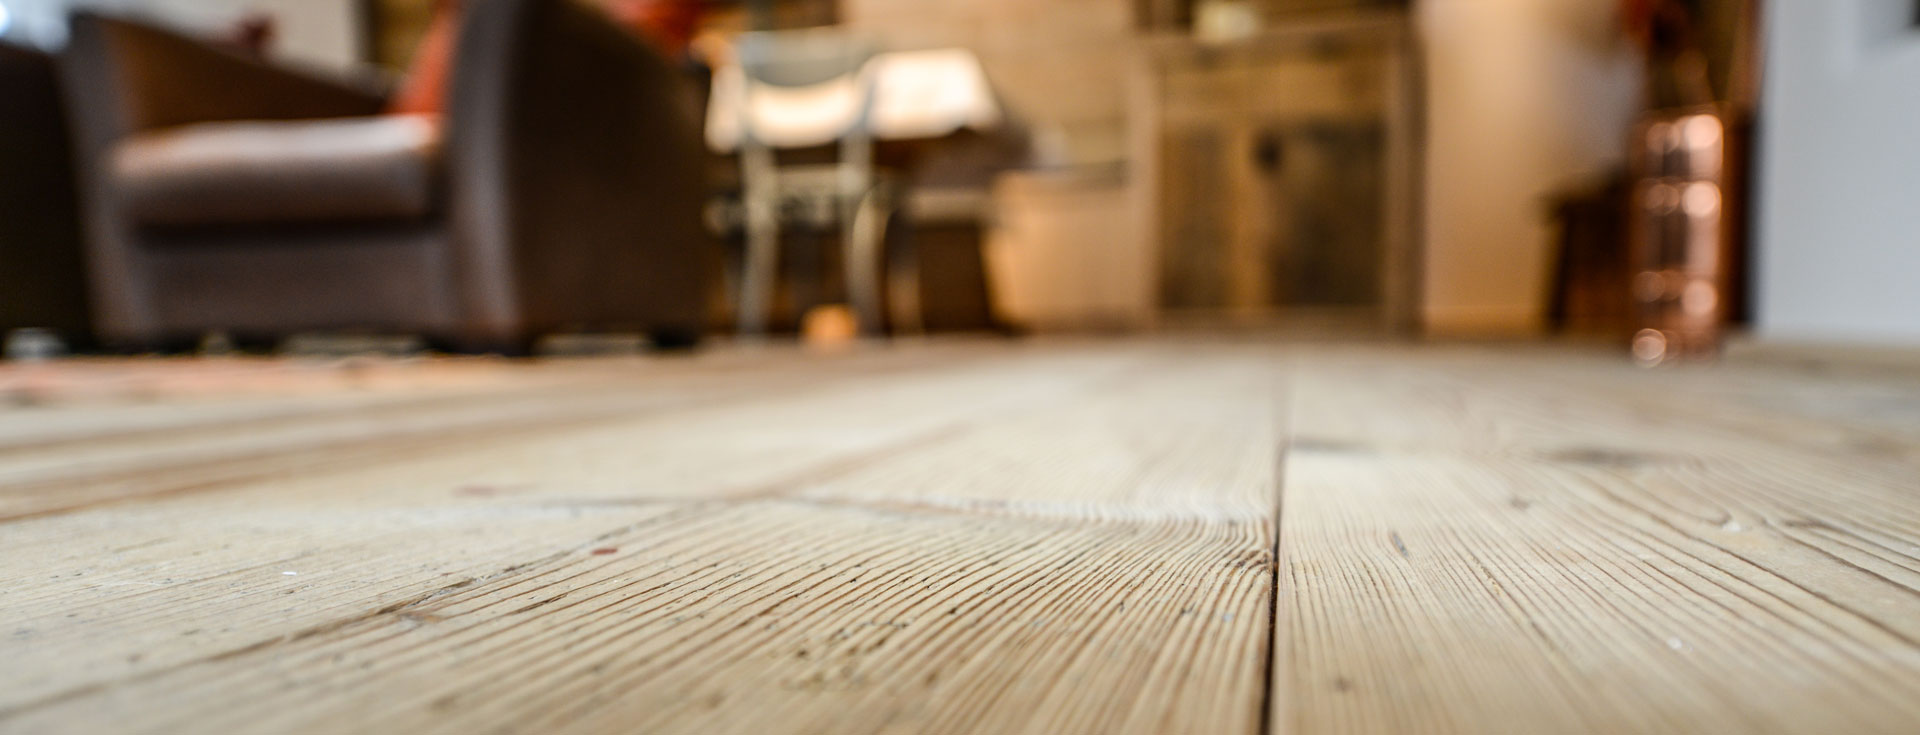 Wilsons Flooring Centre - Wood Flooring